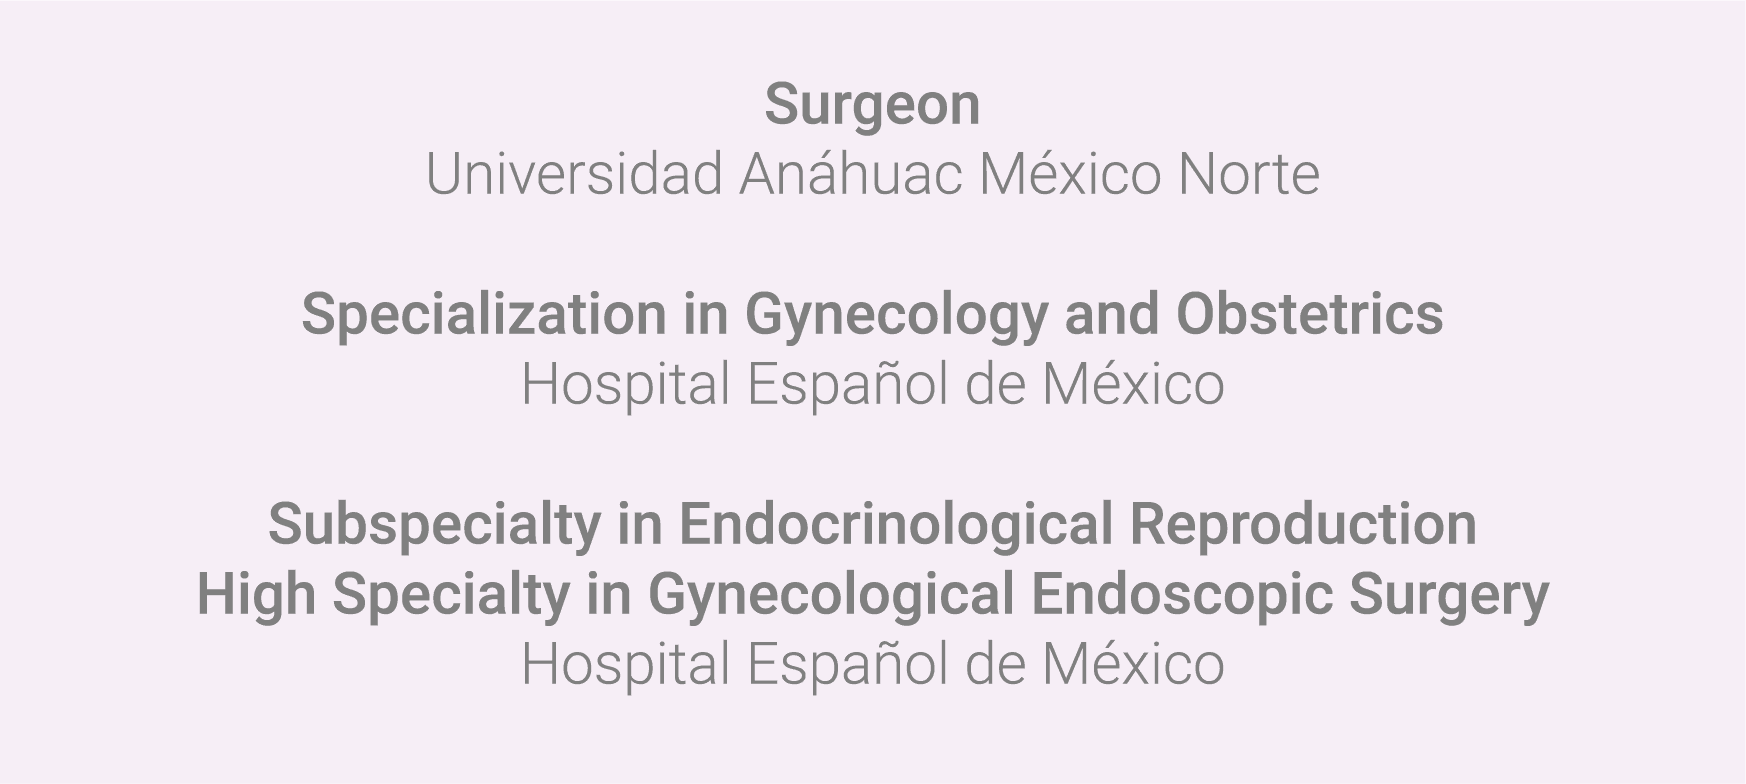 Dr. Rivas info 1